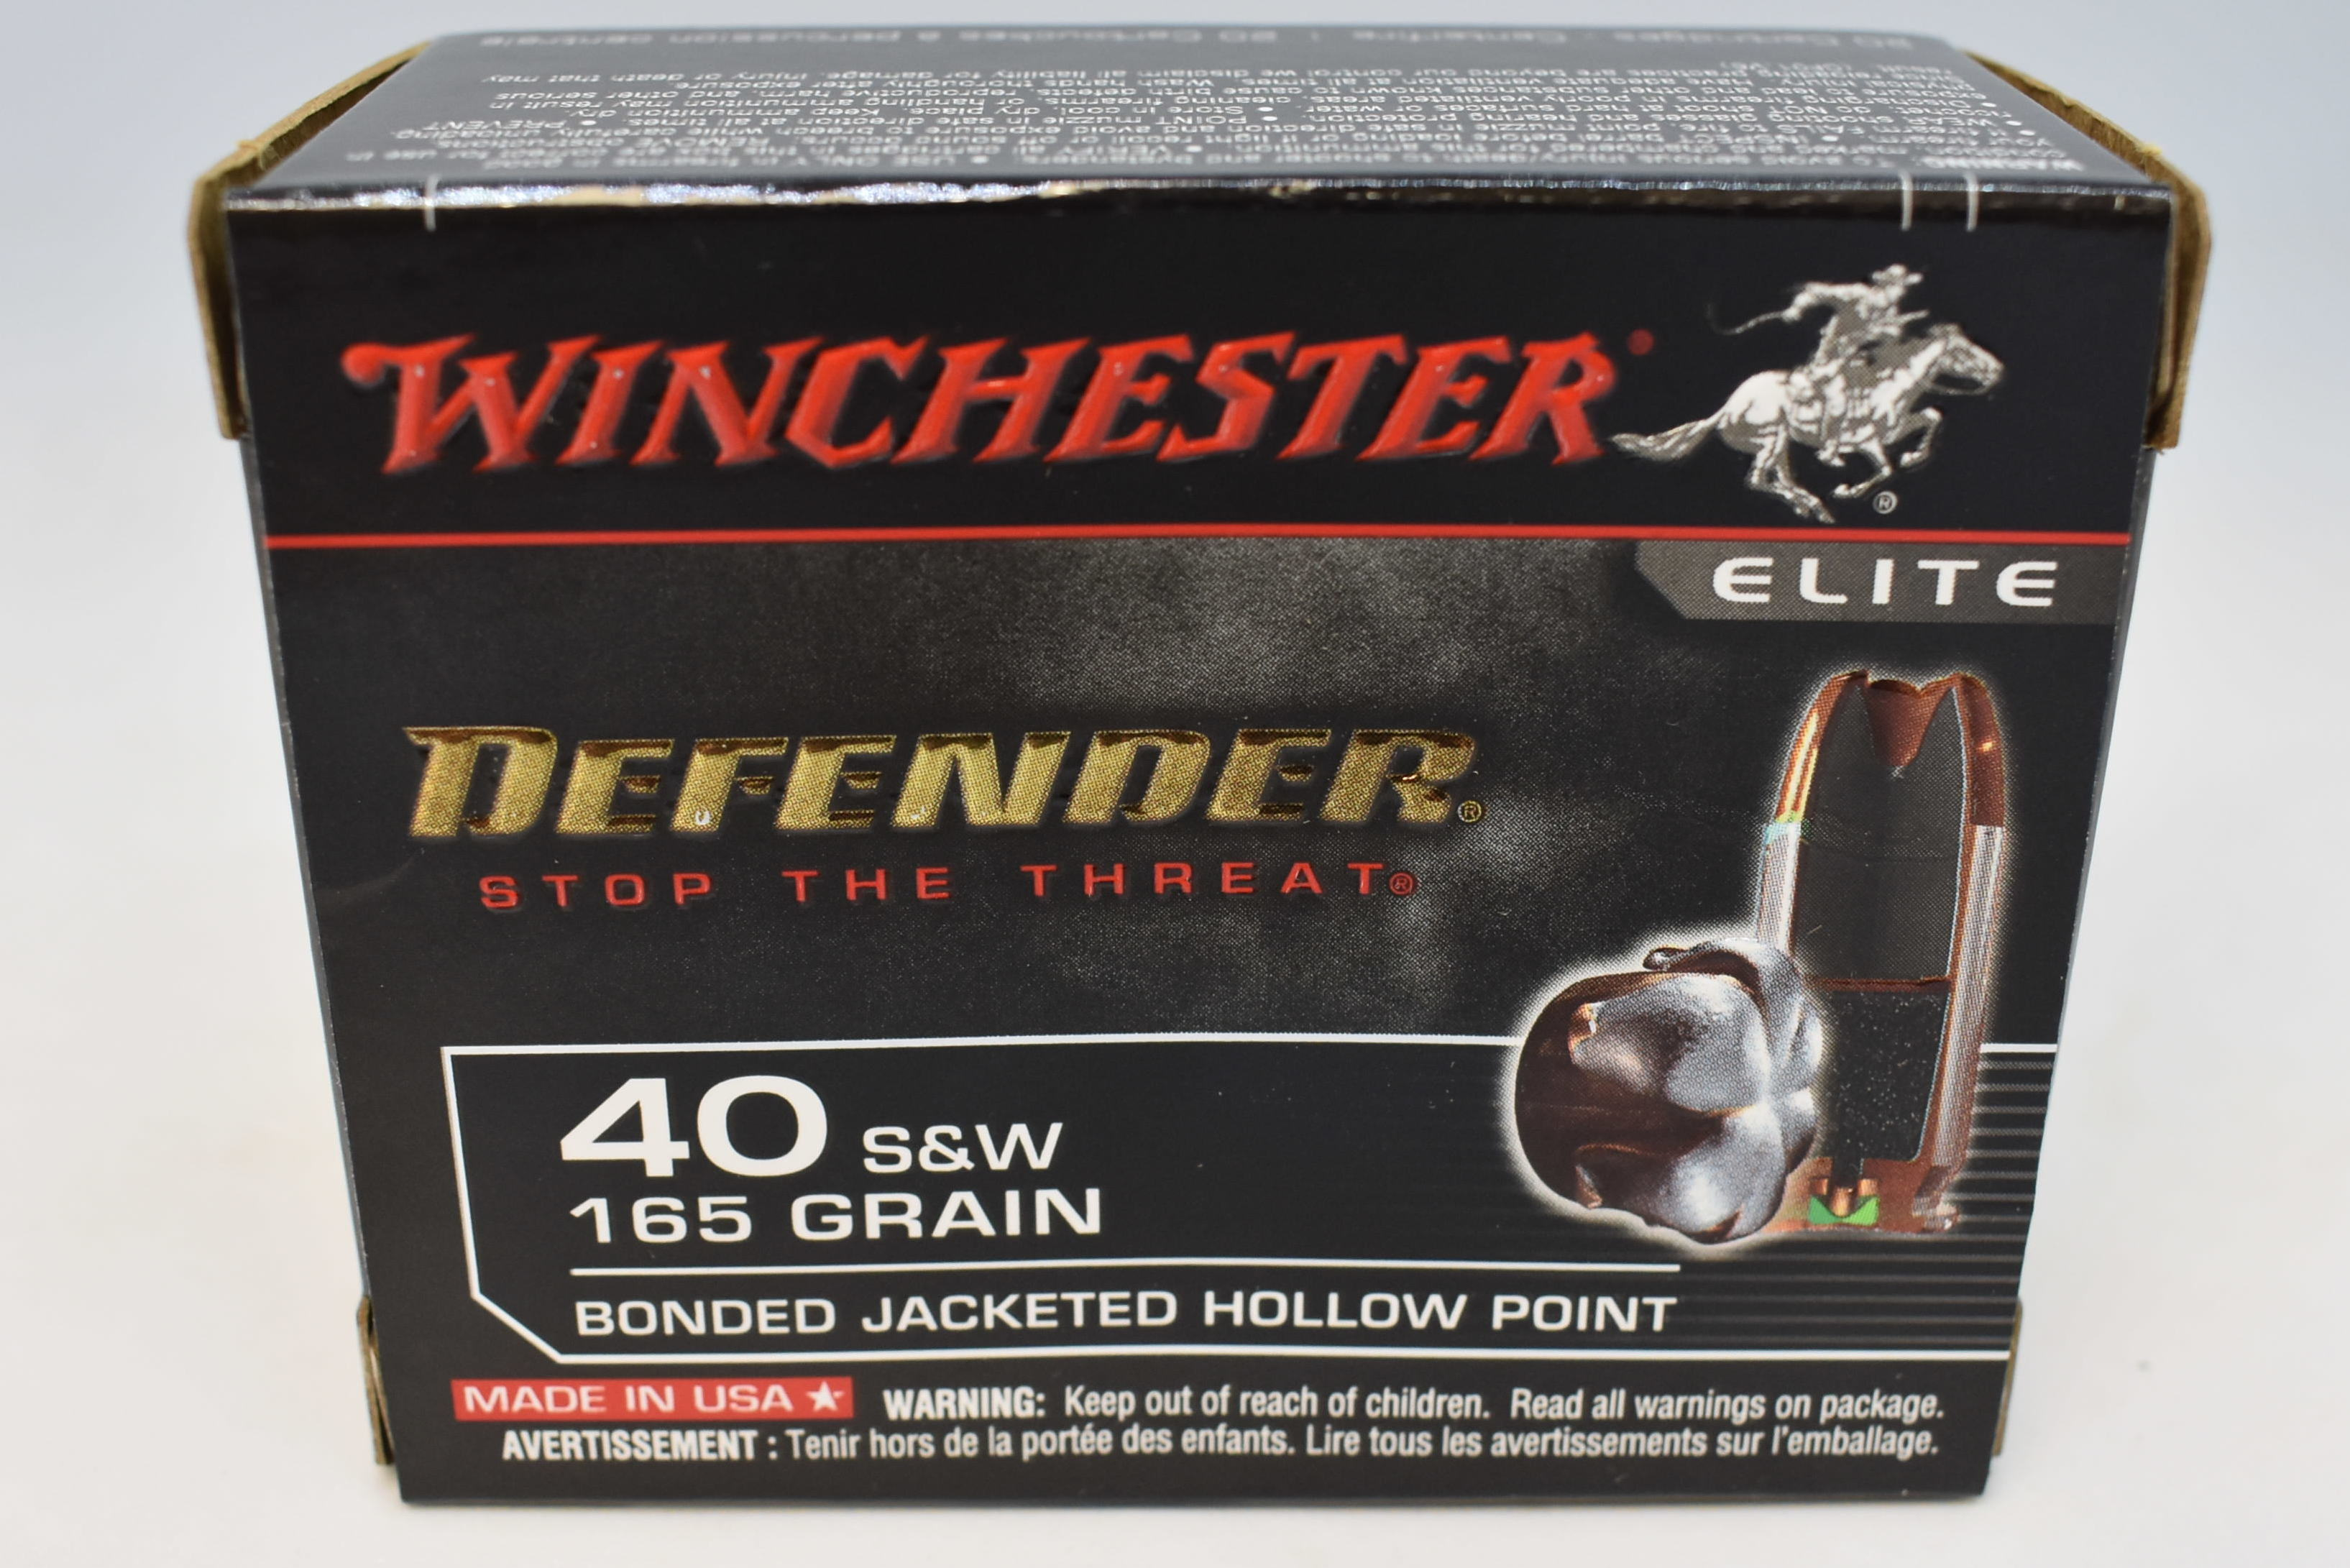 WINCHESTER - 40 - AMMUNITION SPORTING EQUIPMENT